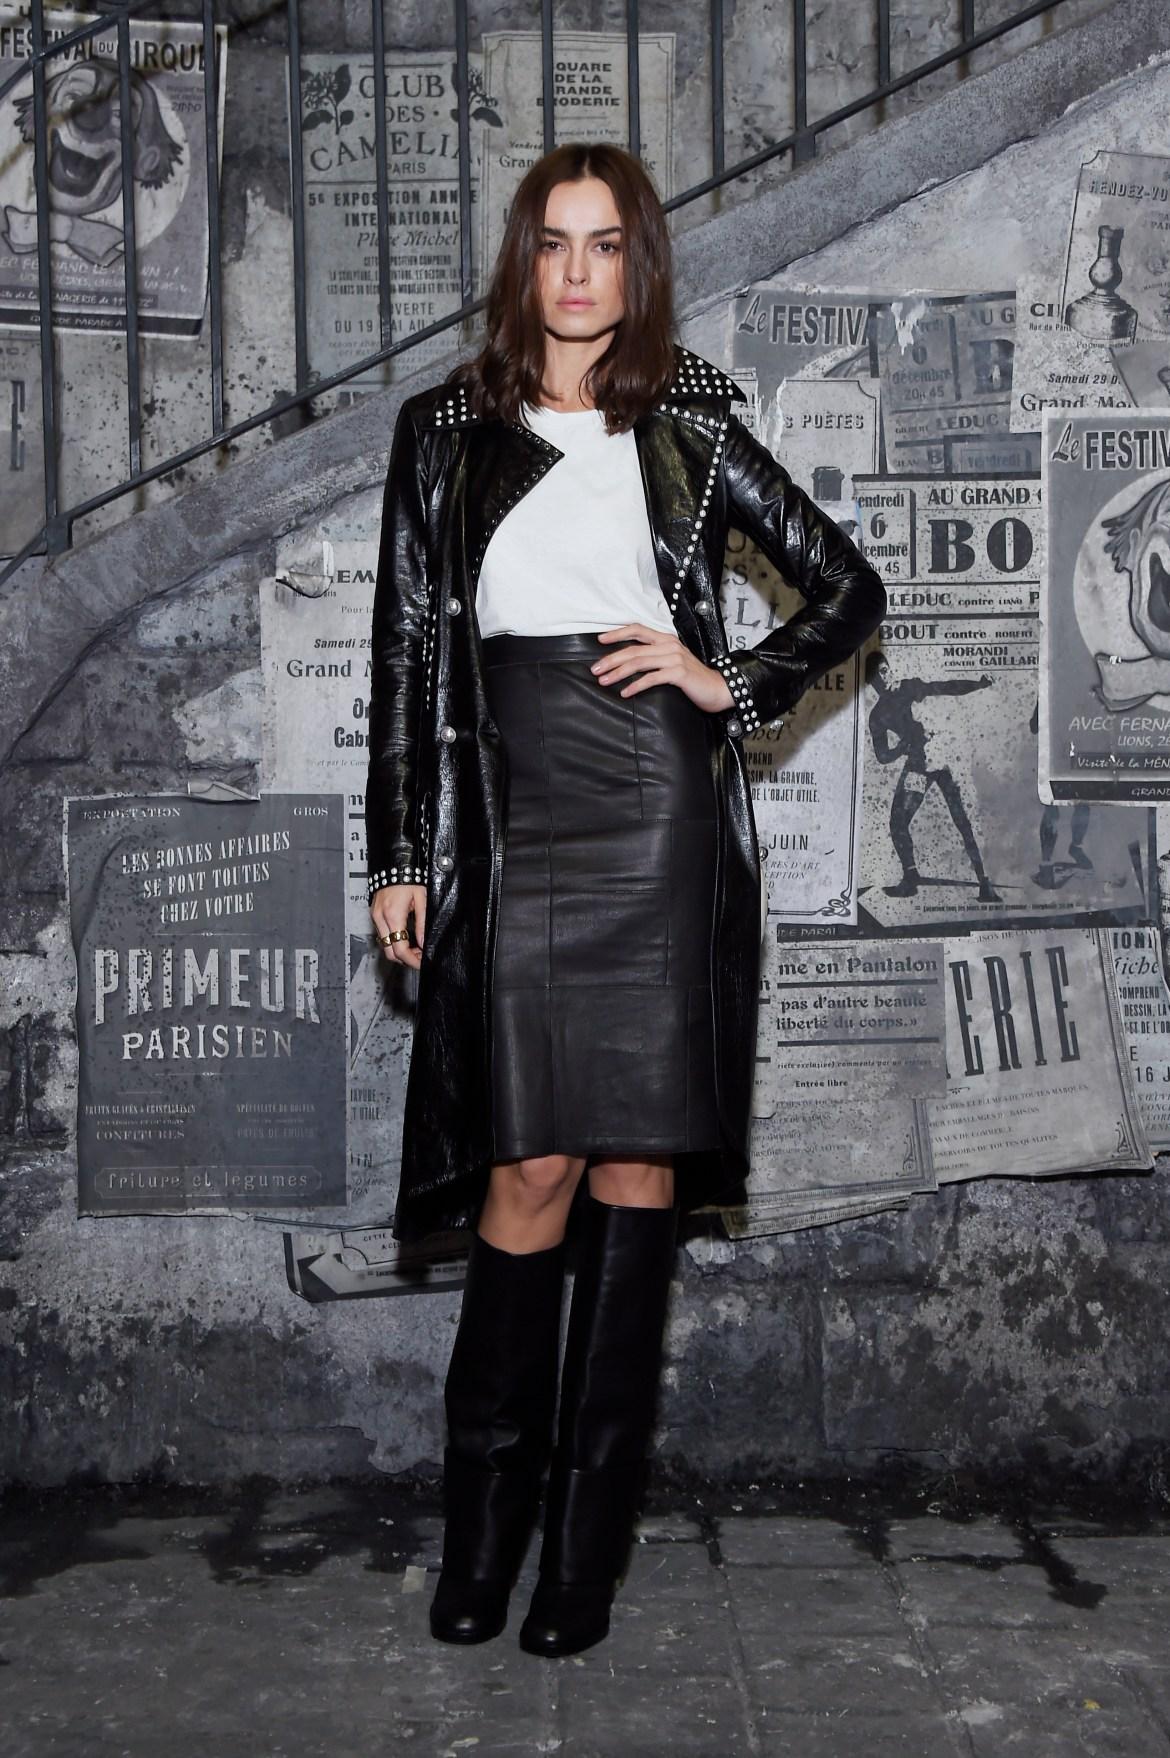 Kasia SMUTNIAK_Paris in Rome 2015-16_Teatro N°5-Cinecitta Studios-Rome_Picture by Aldo Castoldi